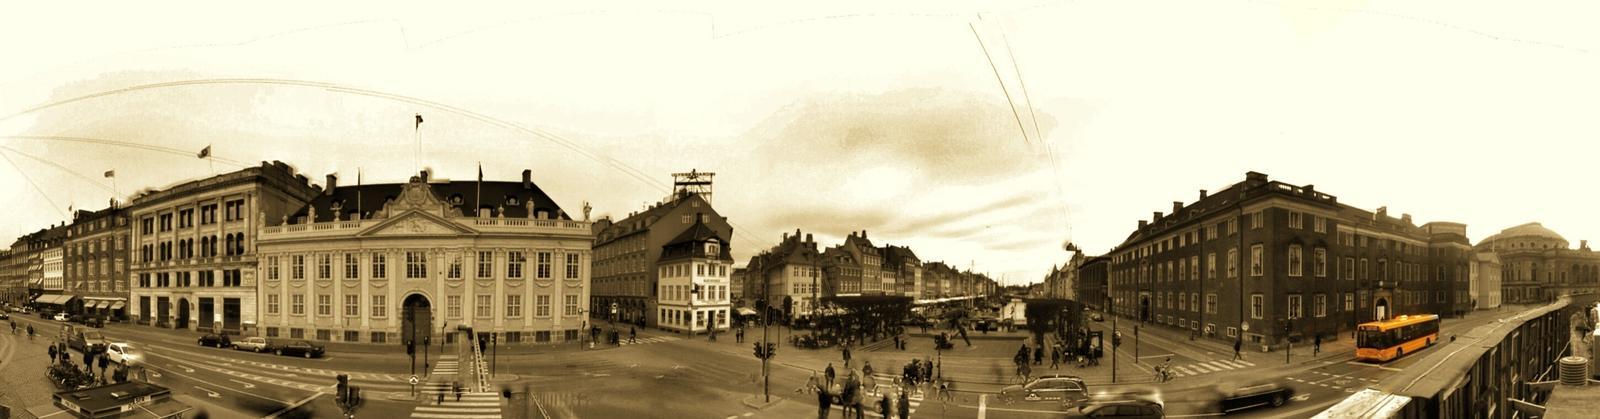 Norway from my lens ... - tato je ale z Kodane